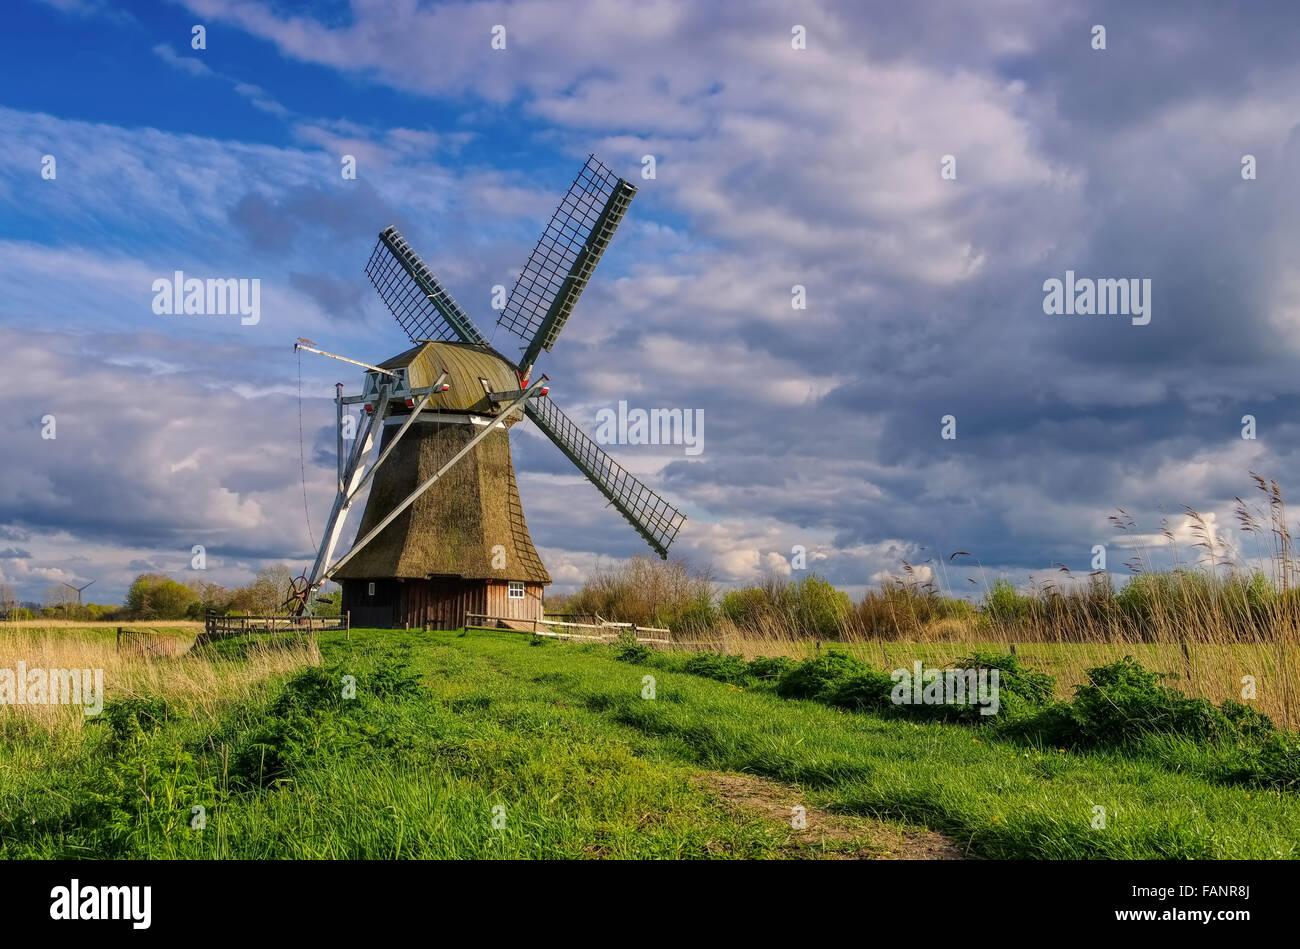 Wedelfelder Muehle - windmill Wedelfeld 03 - Stock Image